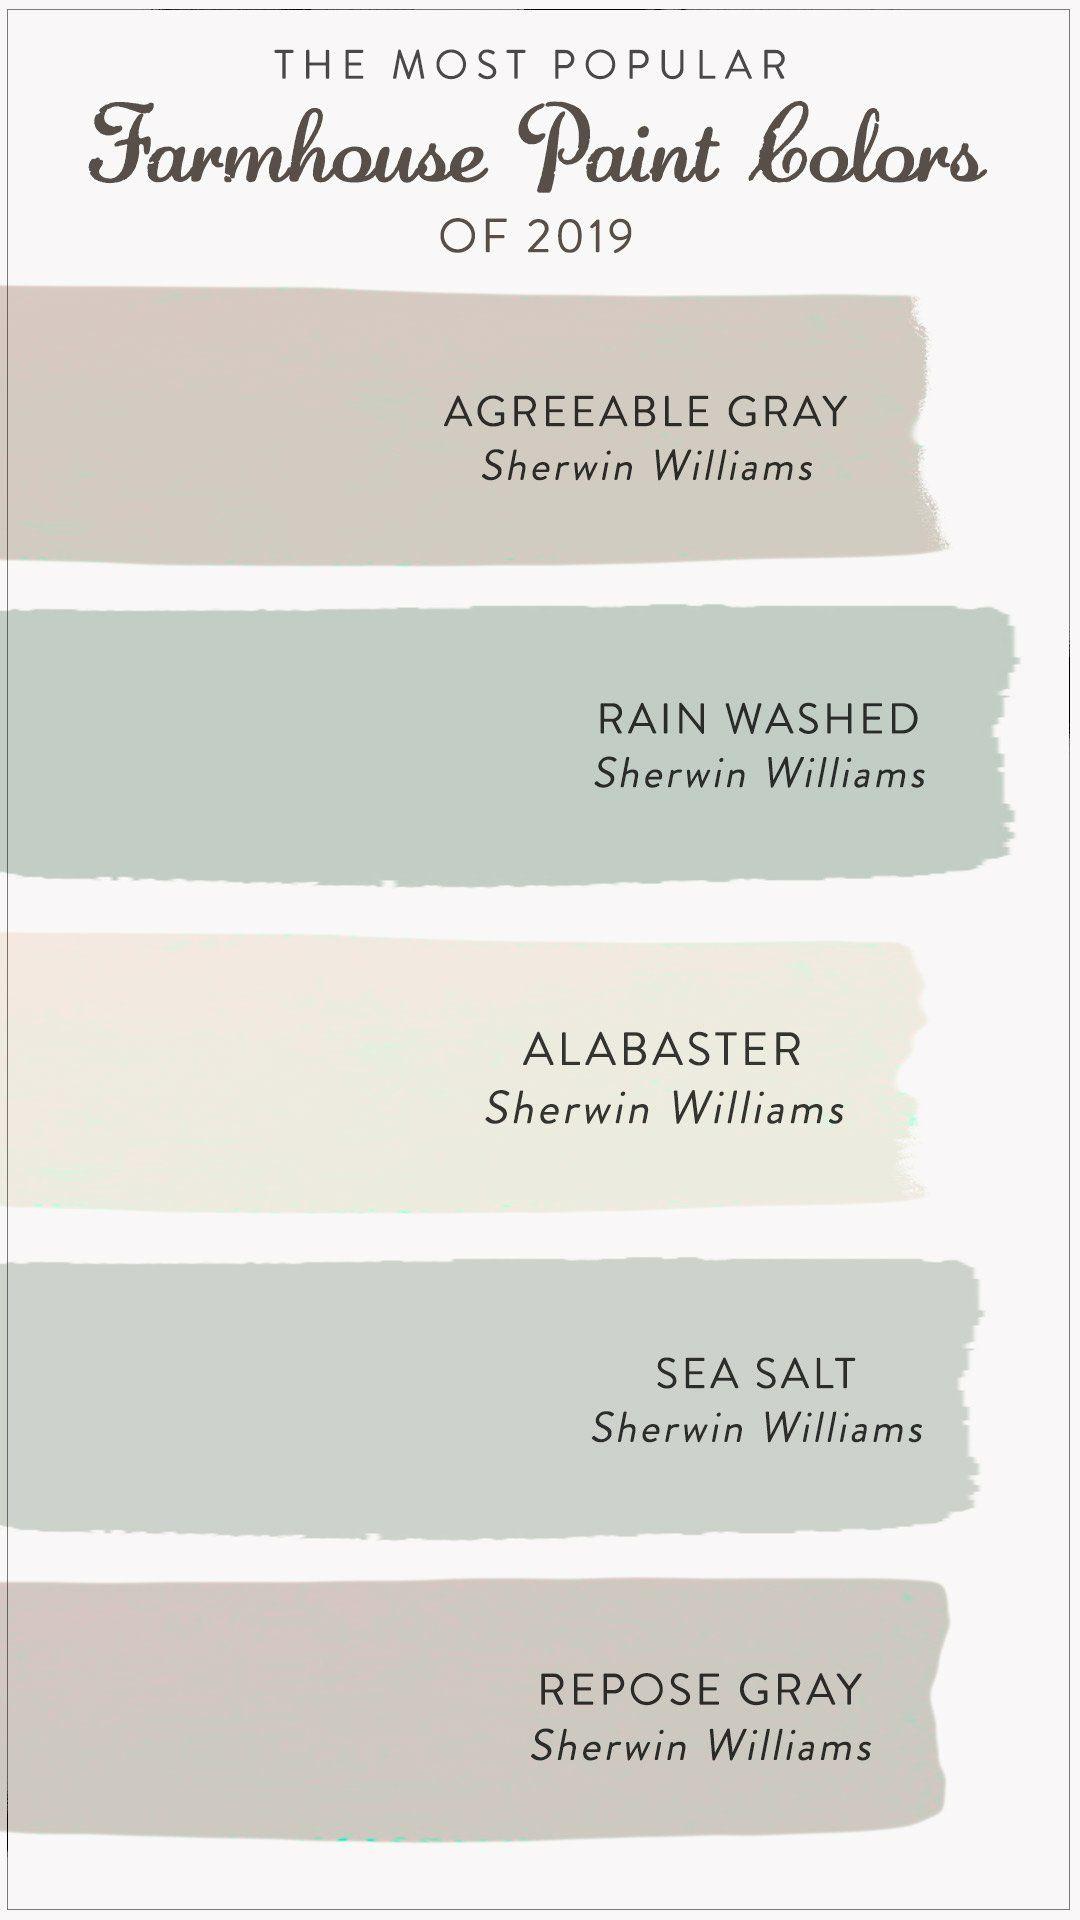 The Most Popular Farmhouse Paint Colors Of 2021 Paint Colors For Home Farmhouse Paint Colors Farmhouse Paint